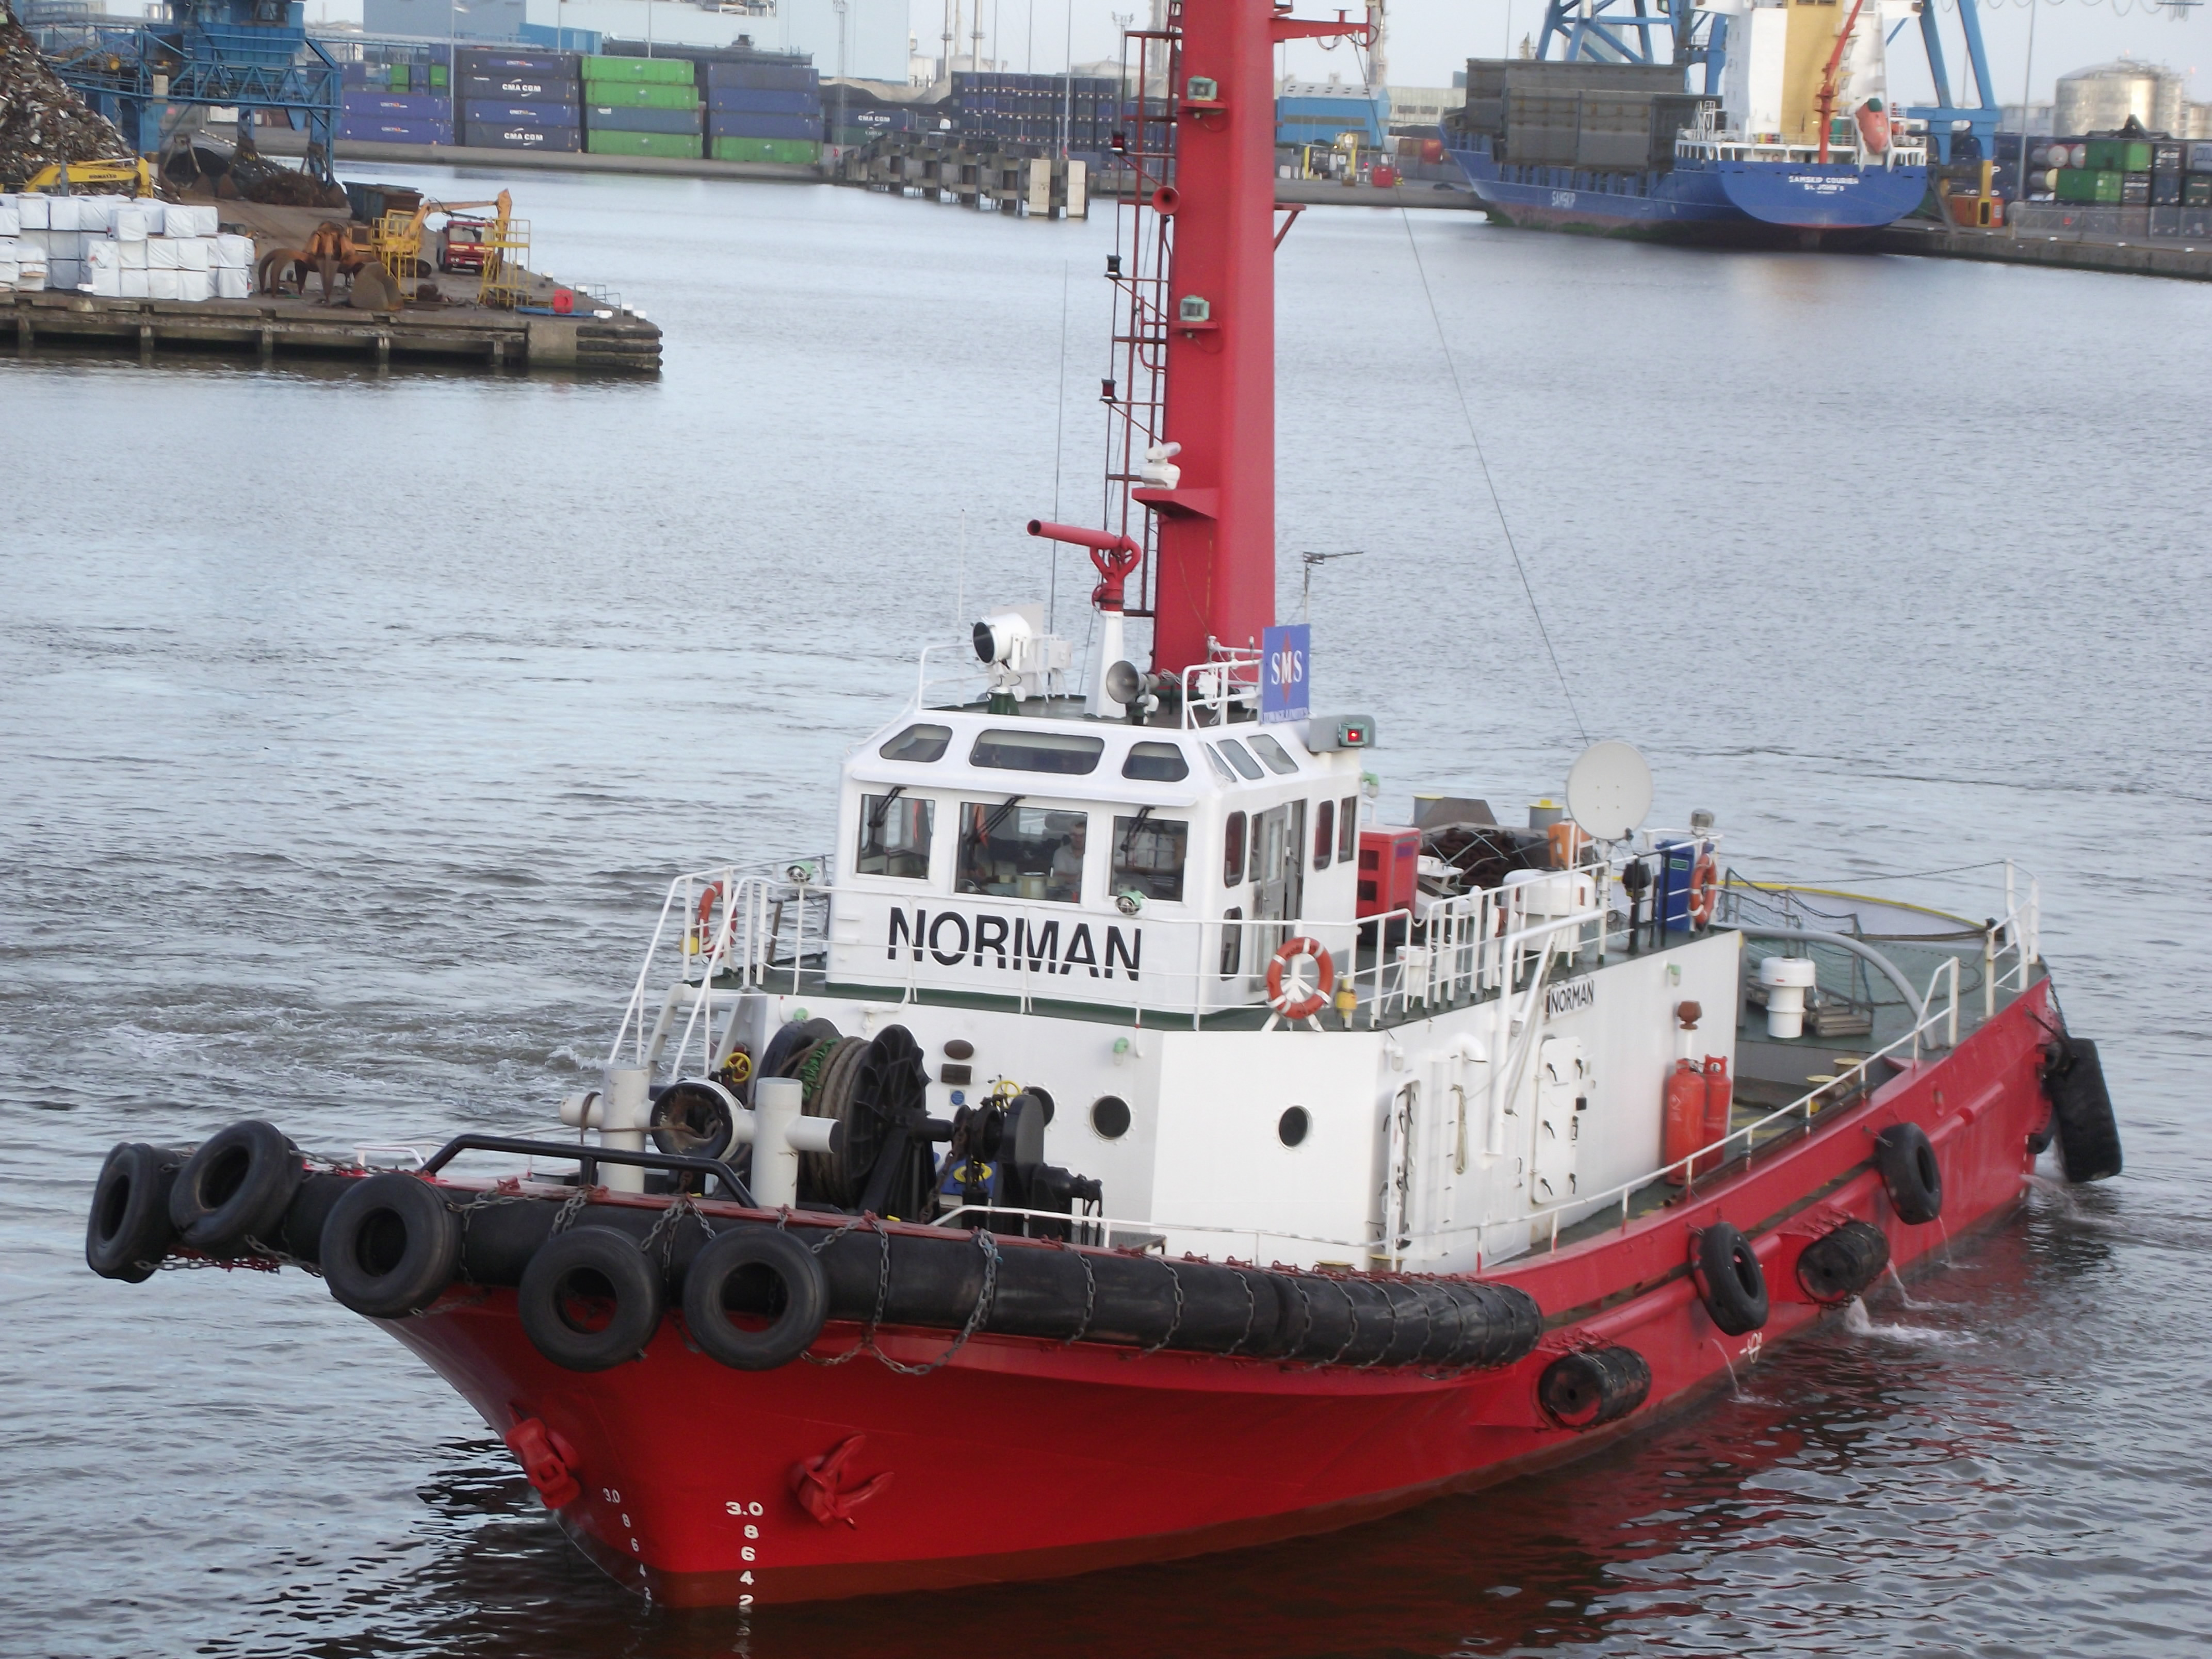 UK Tug boat, 2012, Boat, Dawn, England, HQ Photo